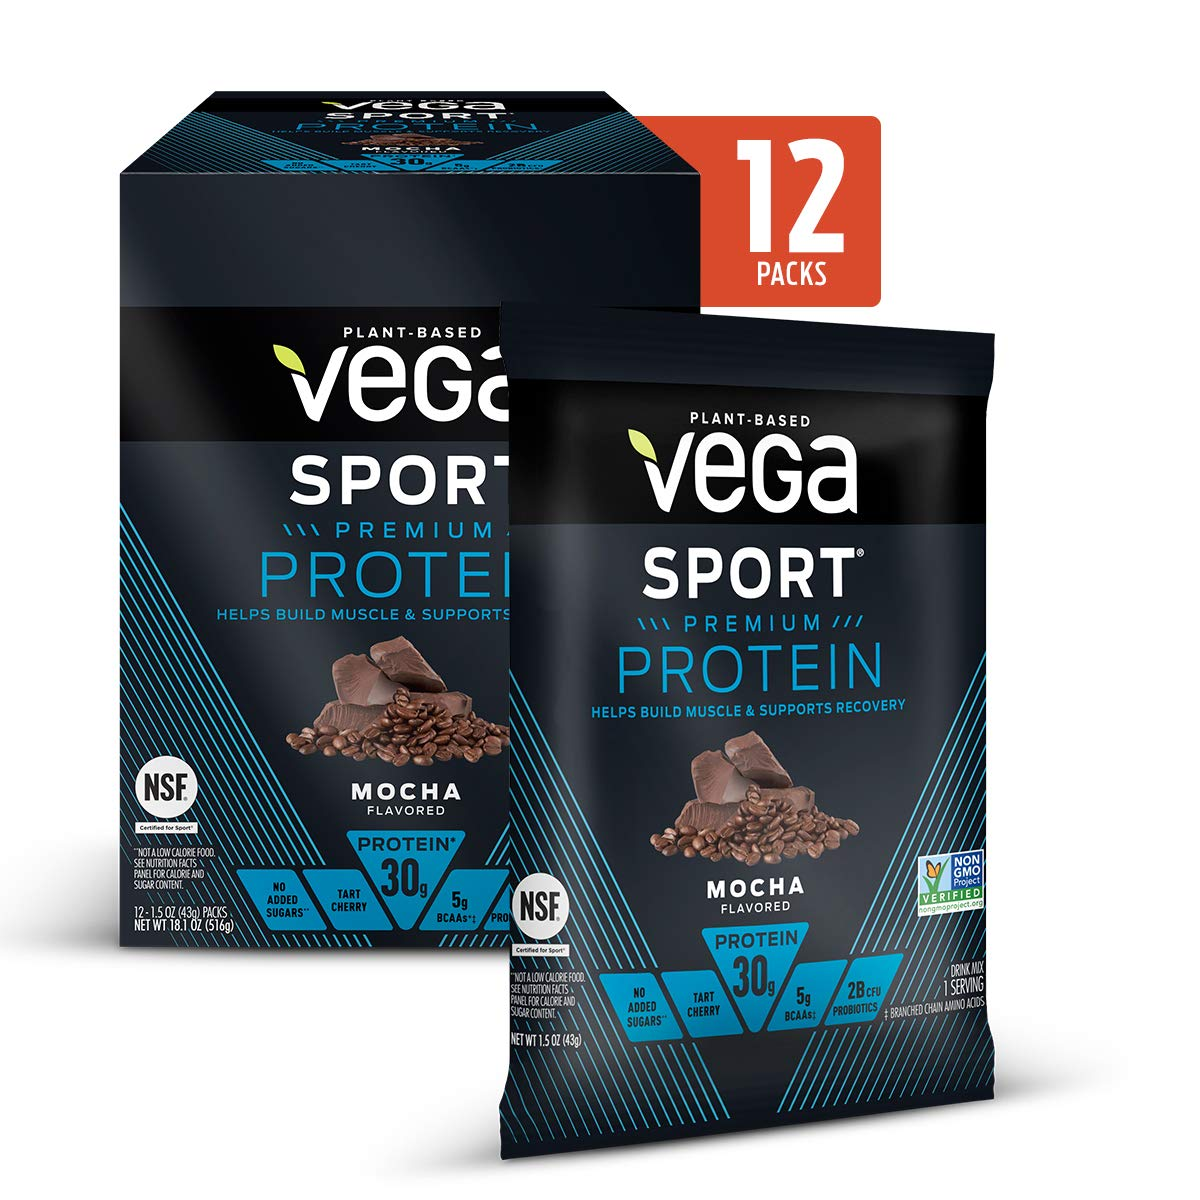 Vega Sport Protein Powder Mocha (12 Count, 18.1 Ounce) - Plant-Based Vegan Protein Powder, BCAAs, Amino Acid, tart cherry, Non Dairy, Keto-Friendly, Gluten Free,  Non GMO (Packaging May Vary)